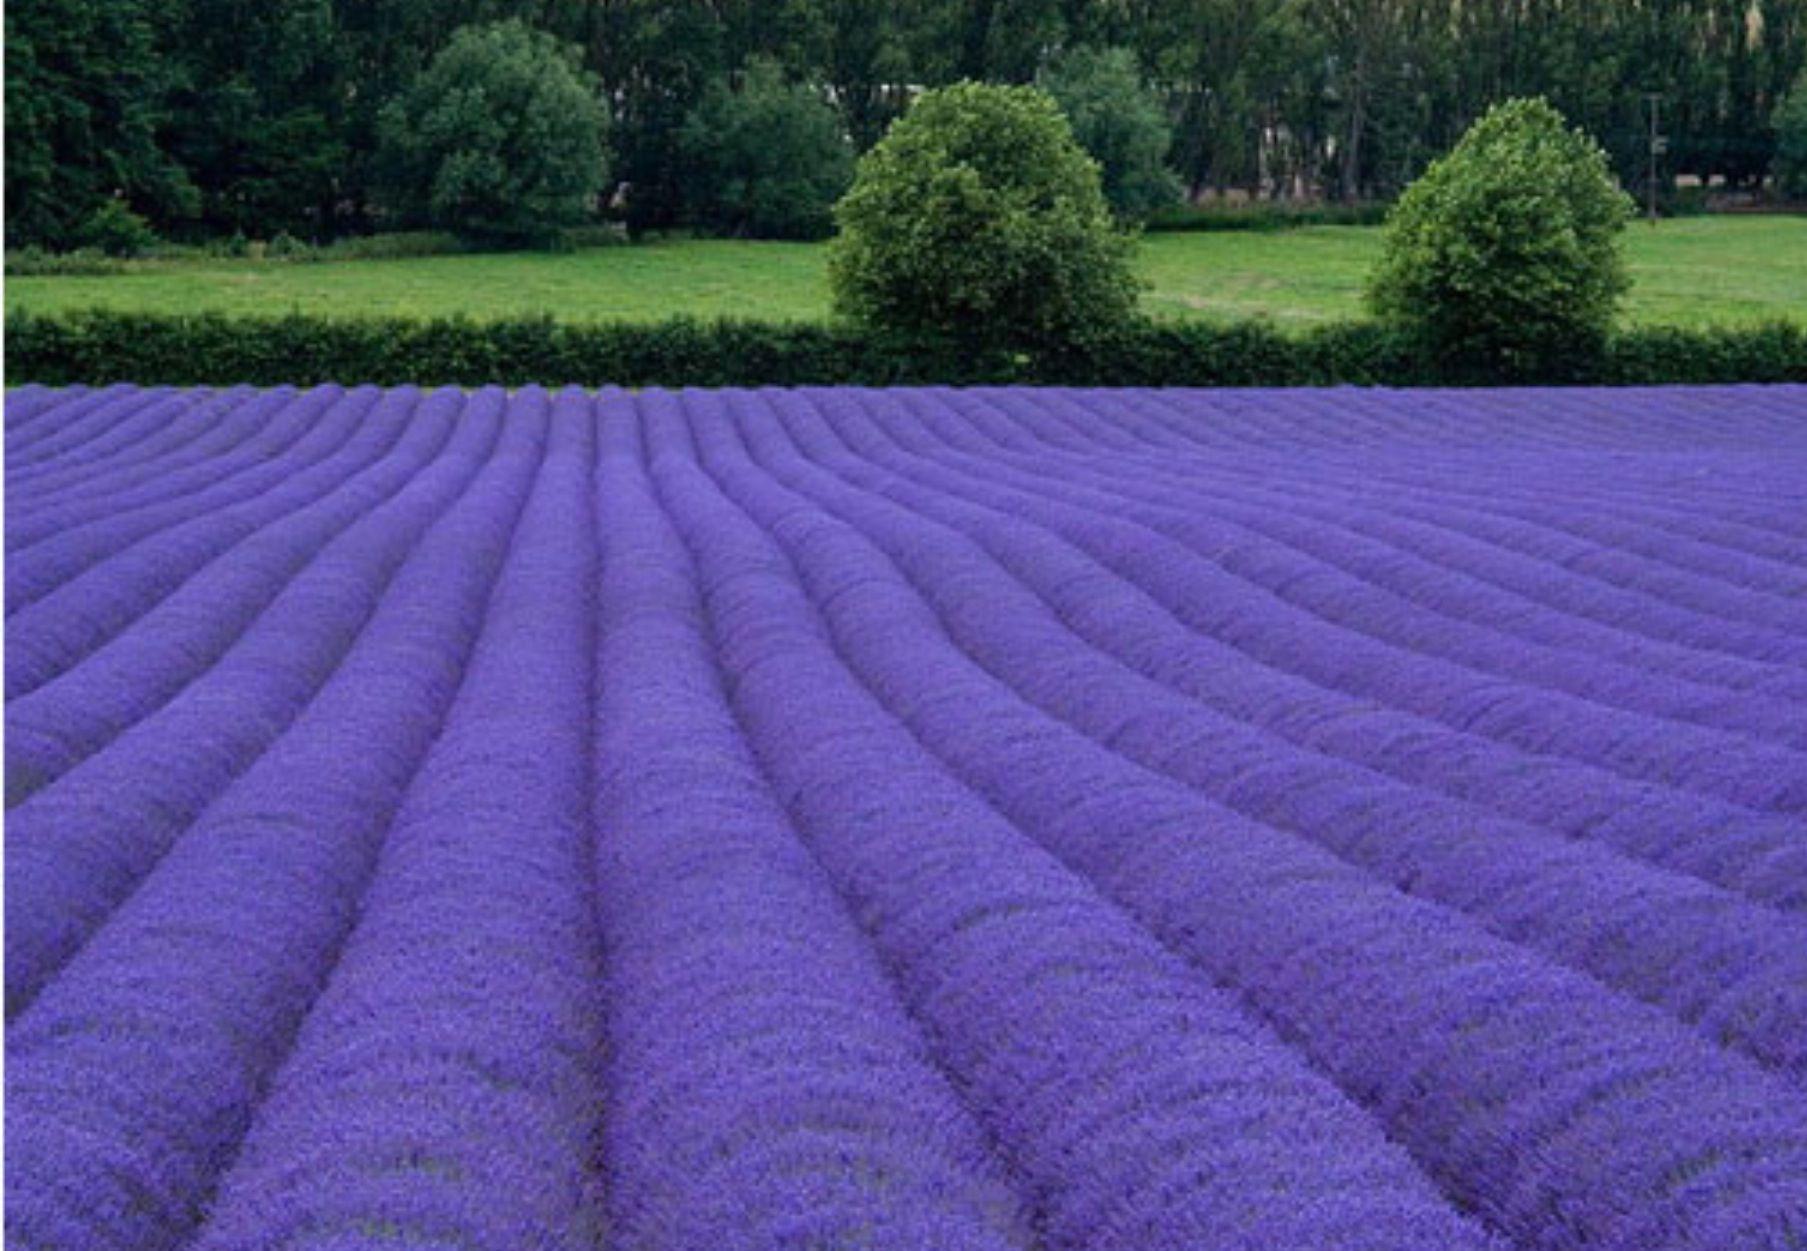 Lavender field in Shoreham, Kent, England (Photo: kentishmayde - Flickr)